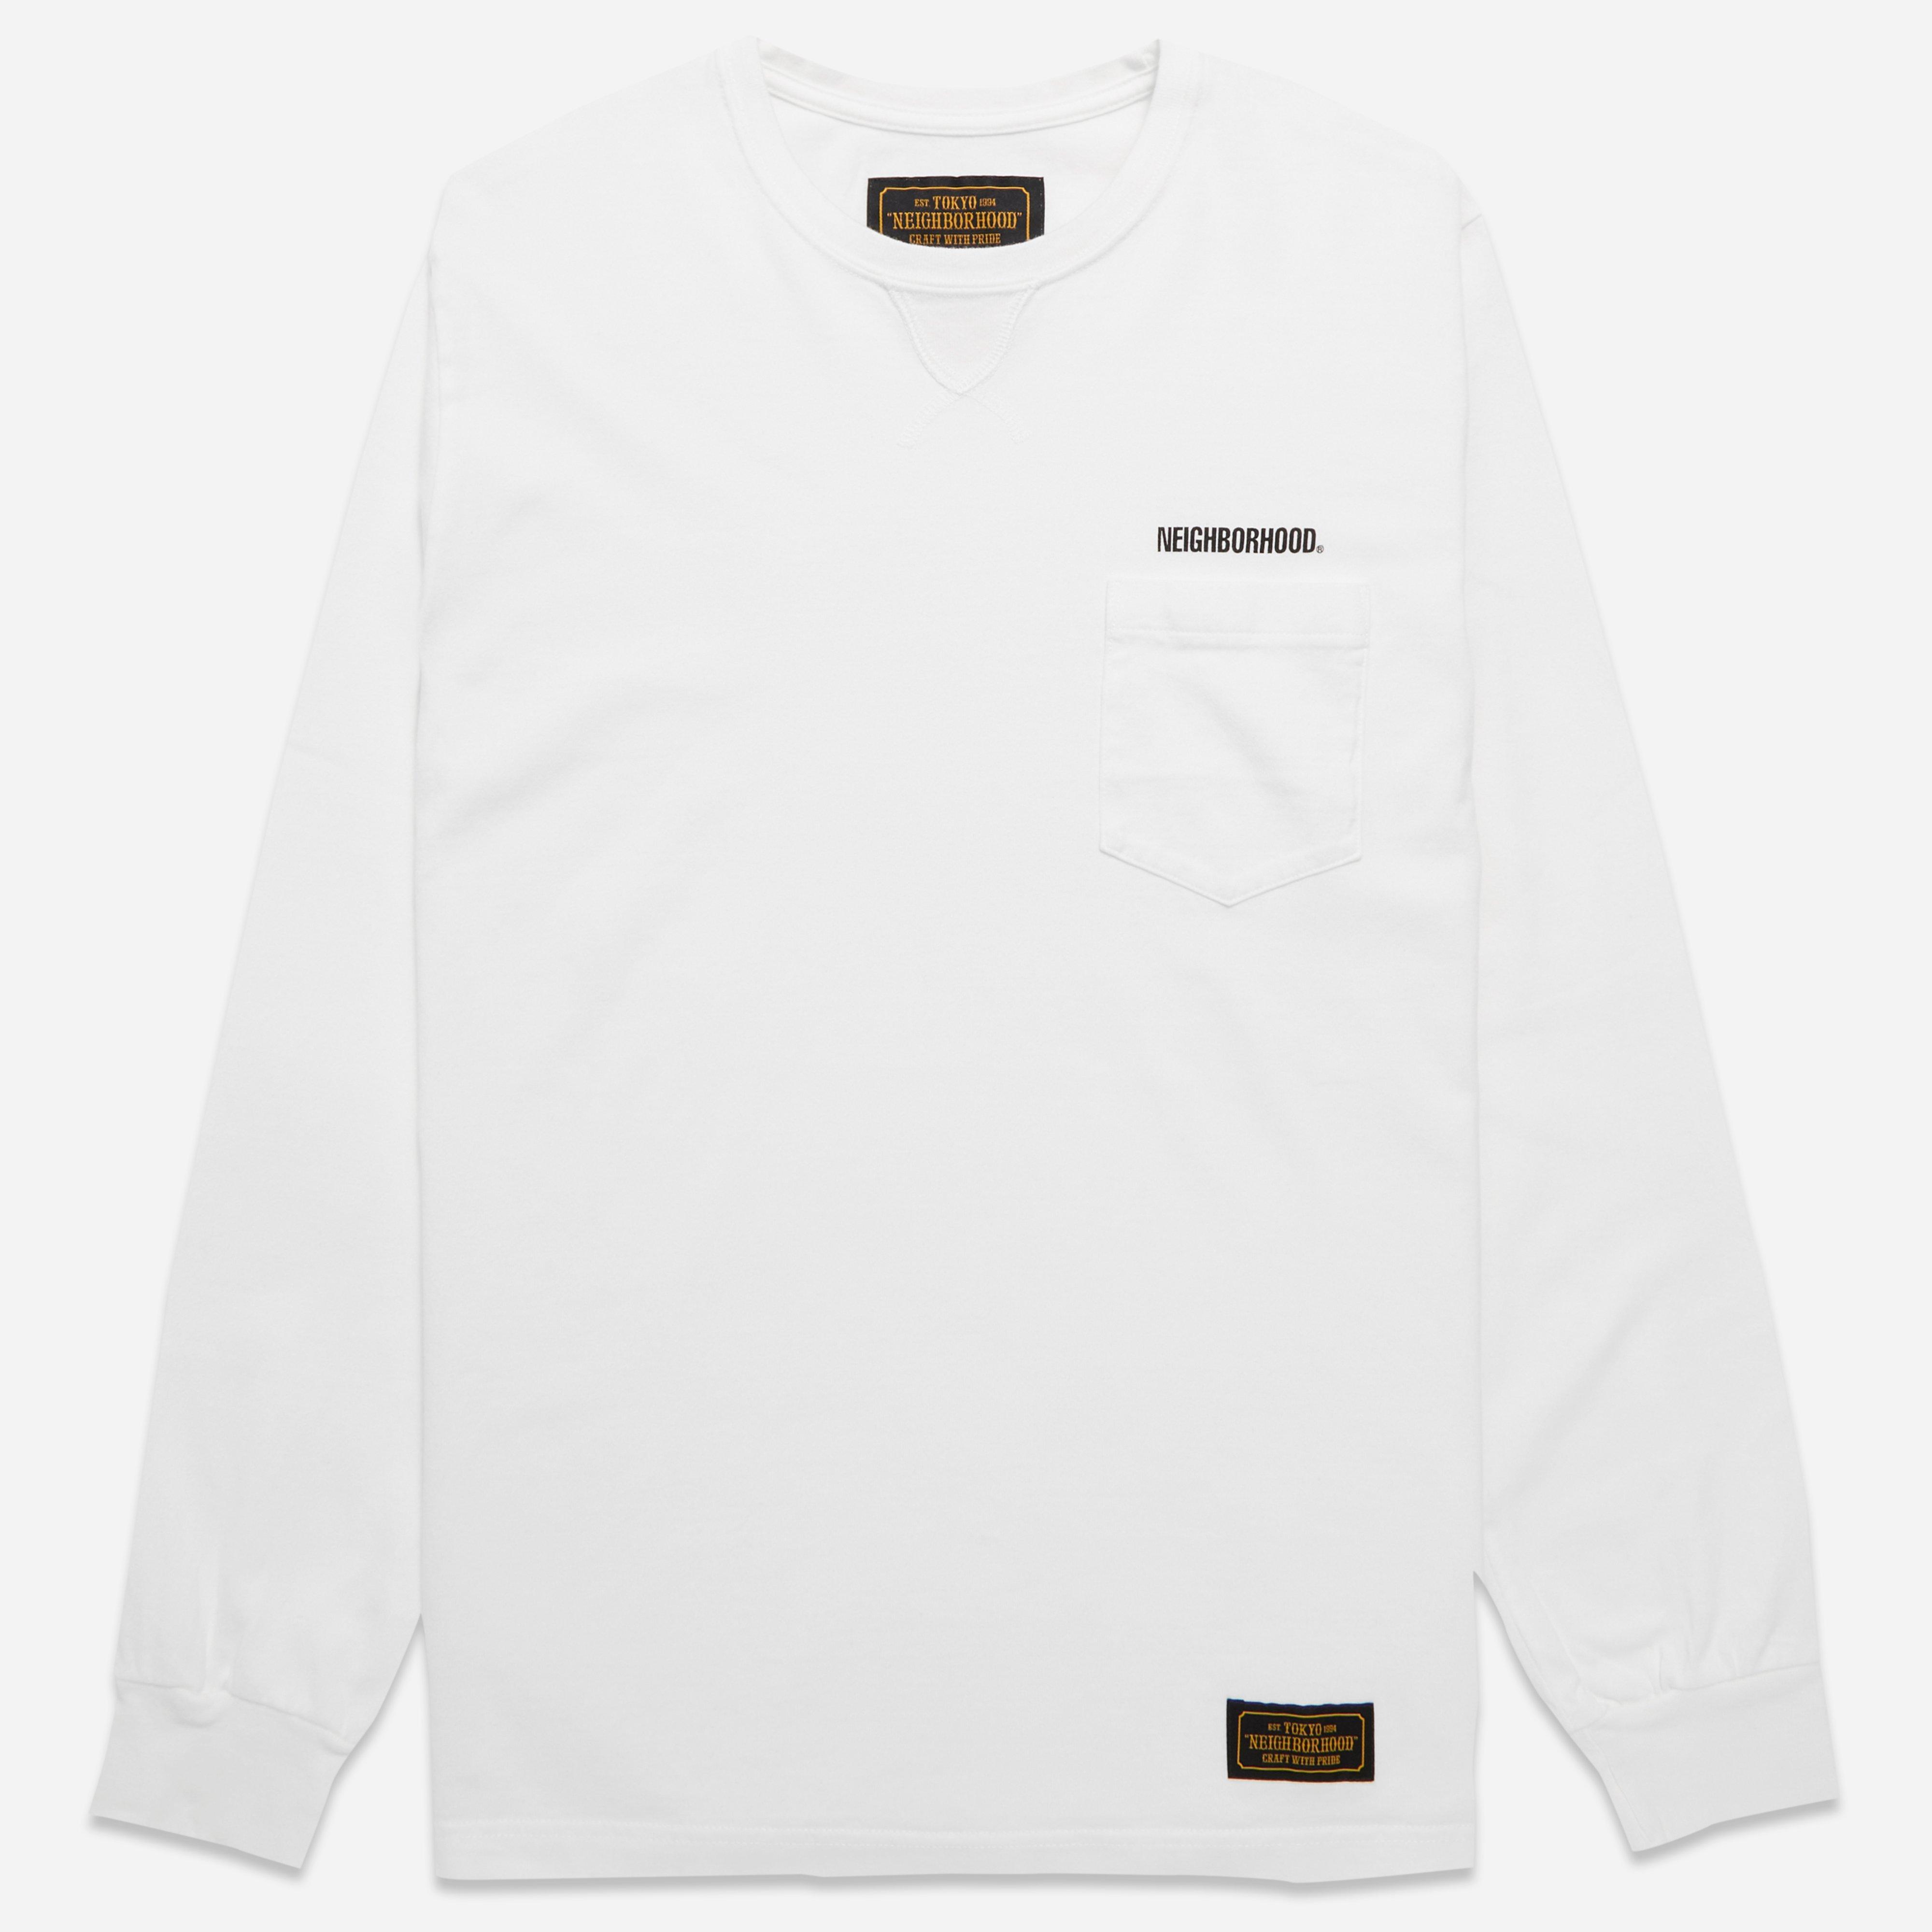 Neighborhood Classic Long Sleeve Pocket T-shirt